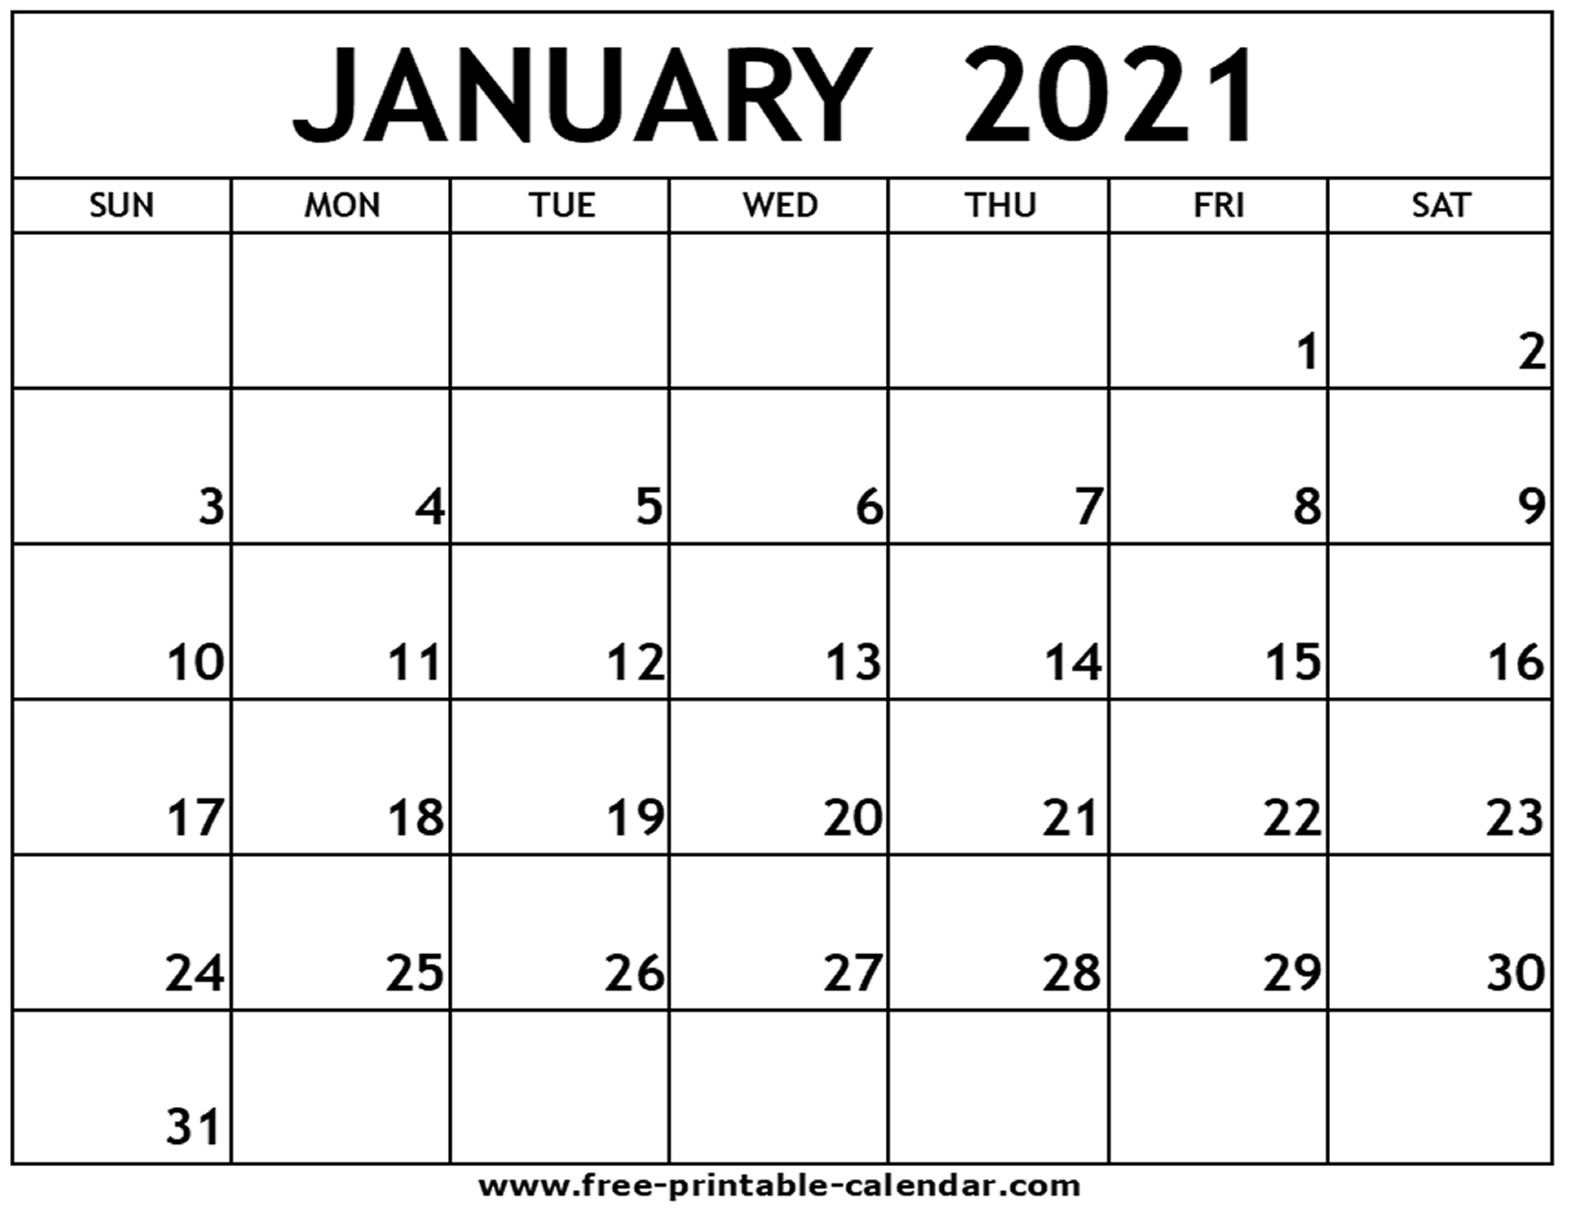 January 2021 Printable Calendar Free Printable Calendar